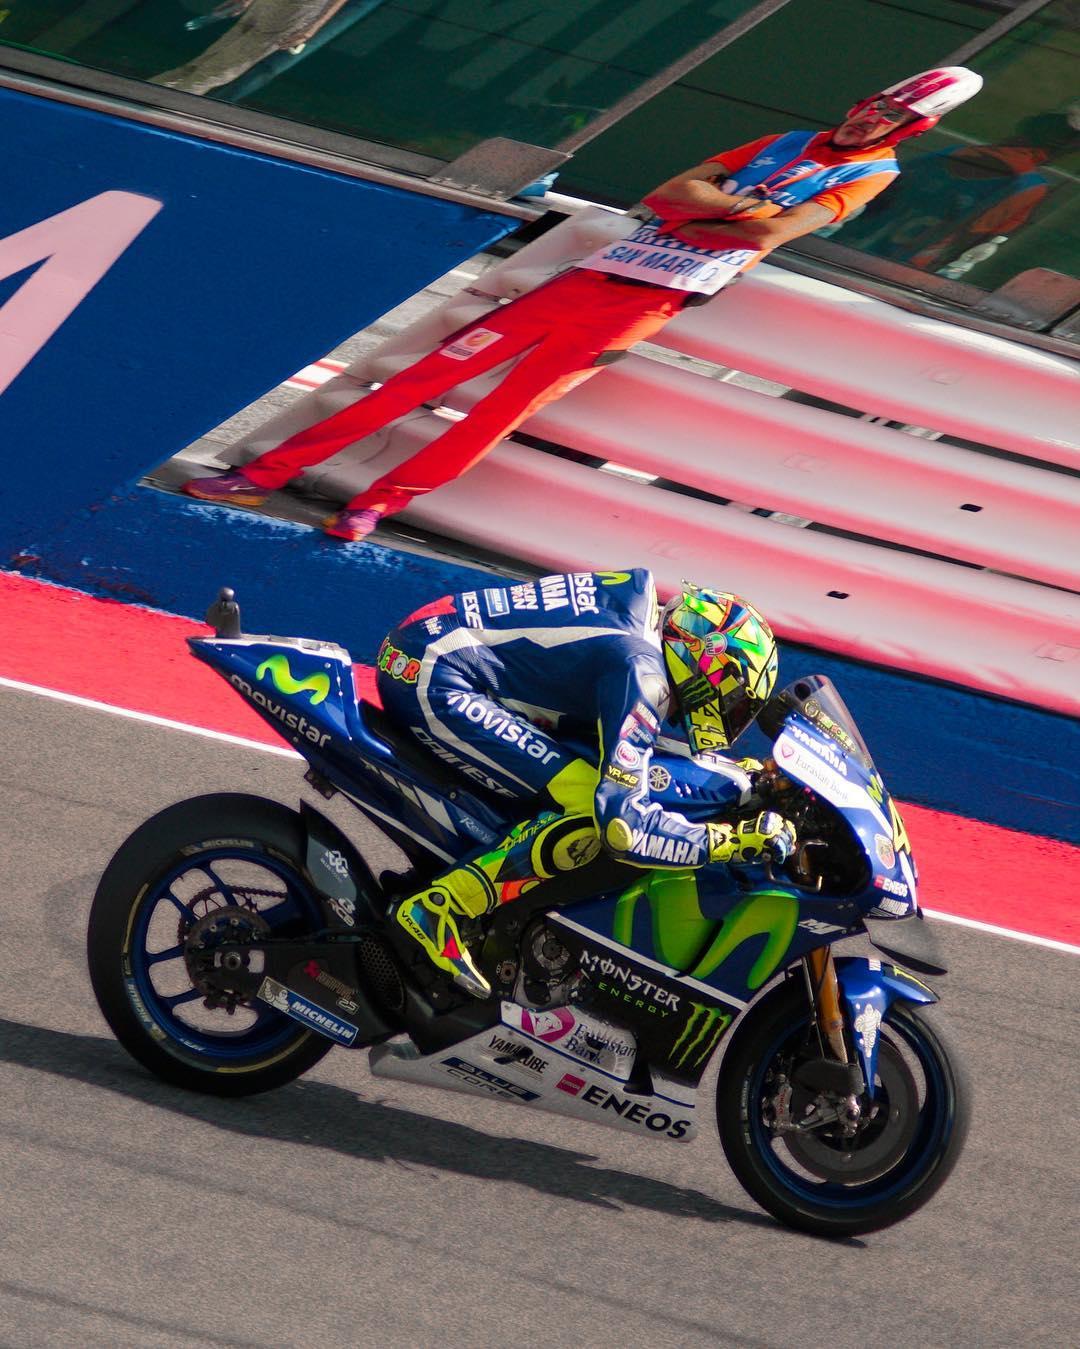 Valentino Rossi & Marshall @245kph -